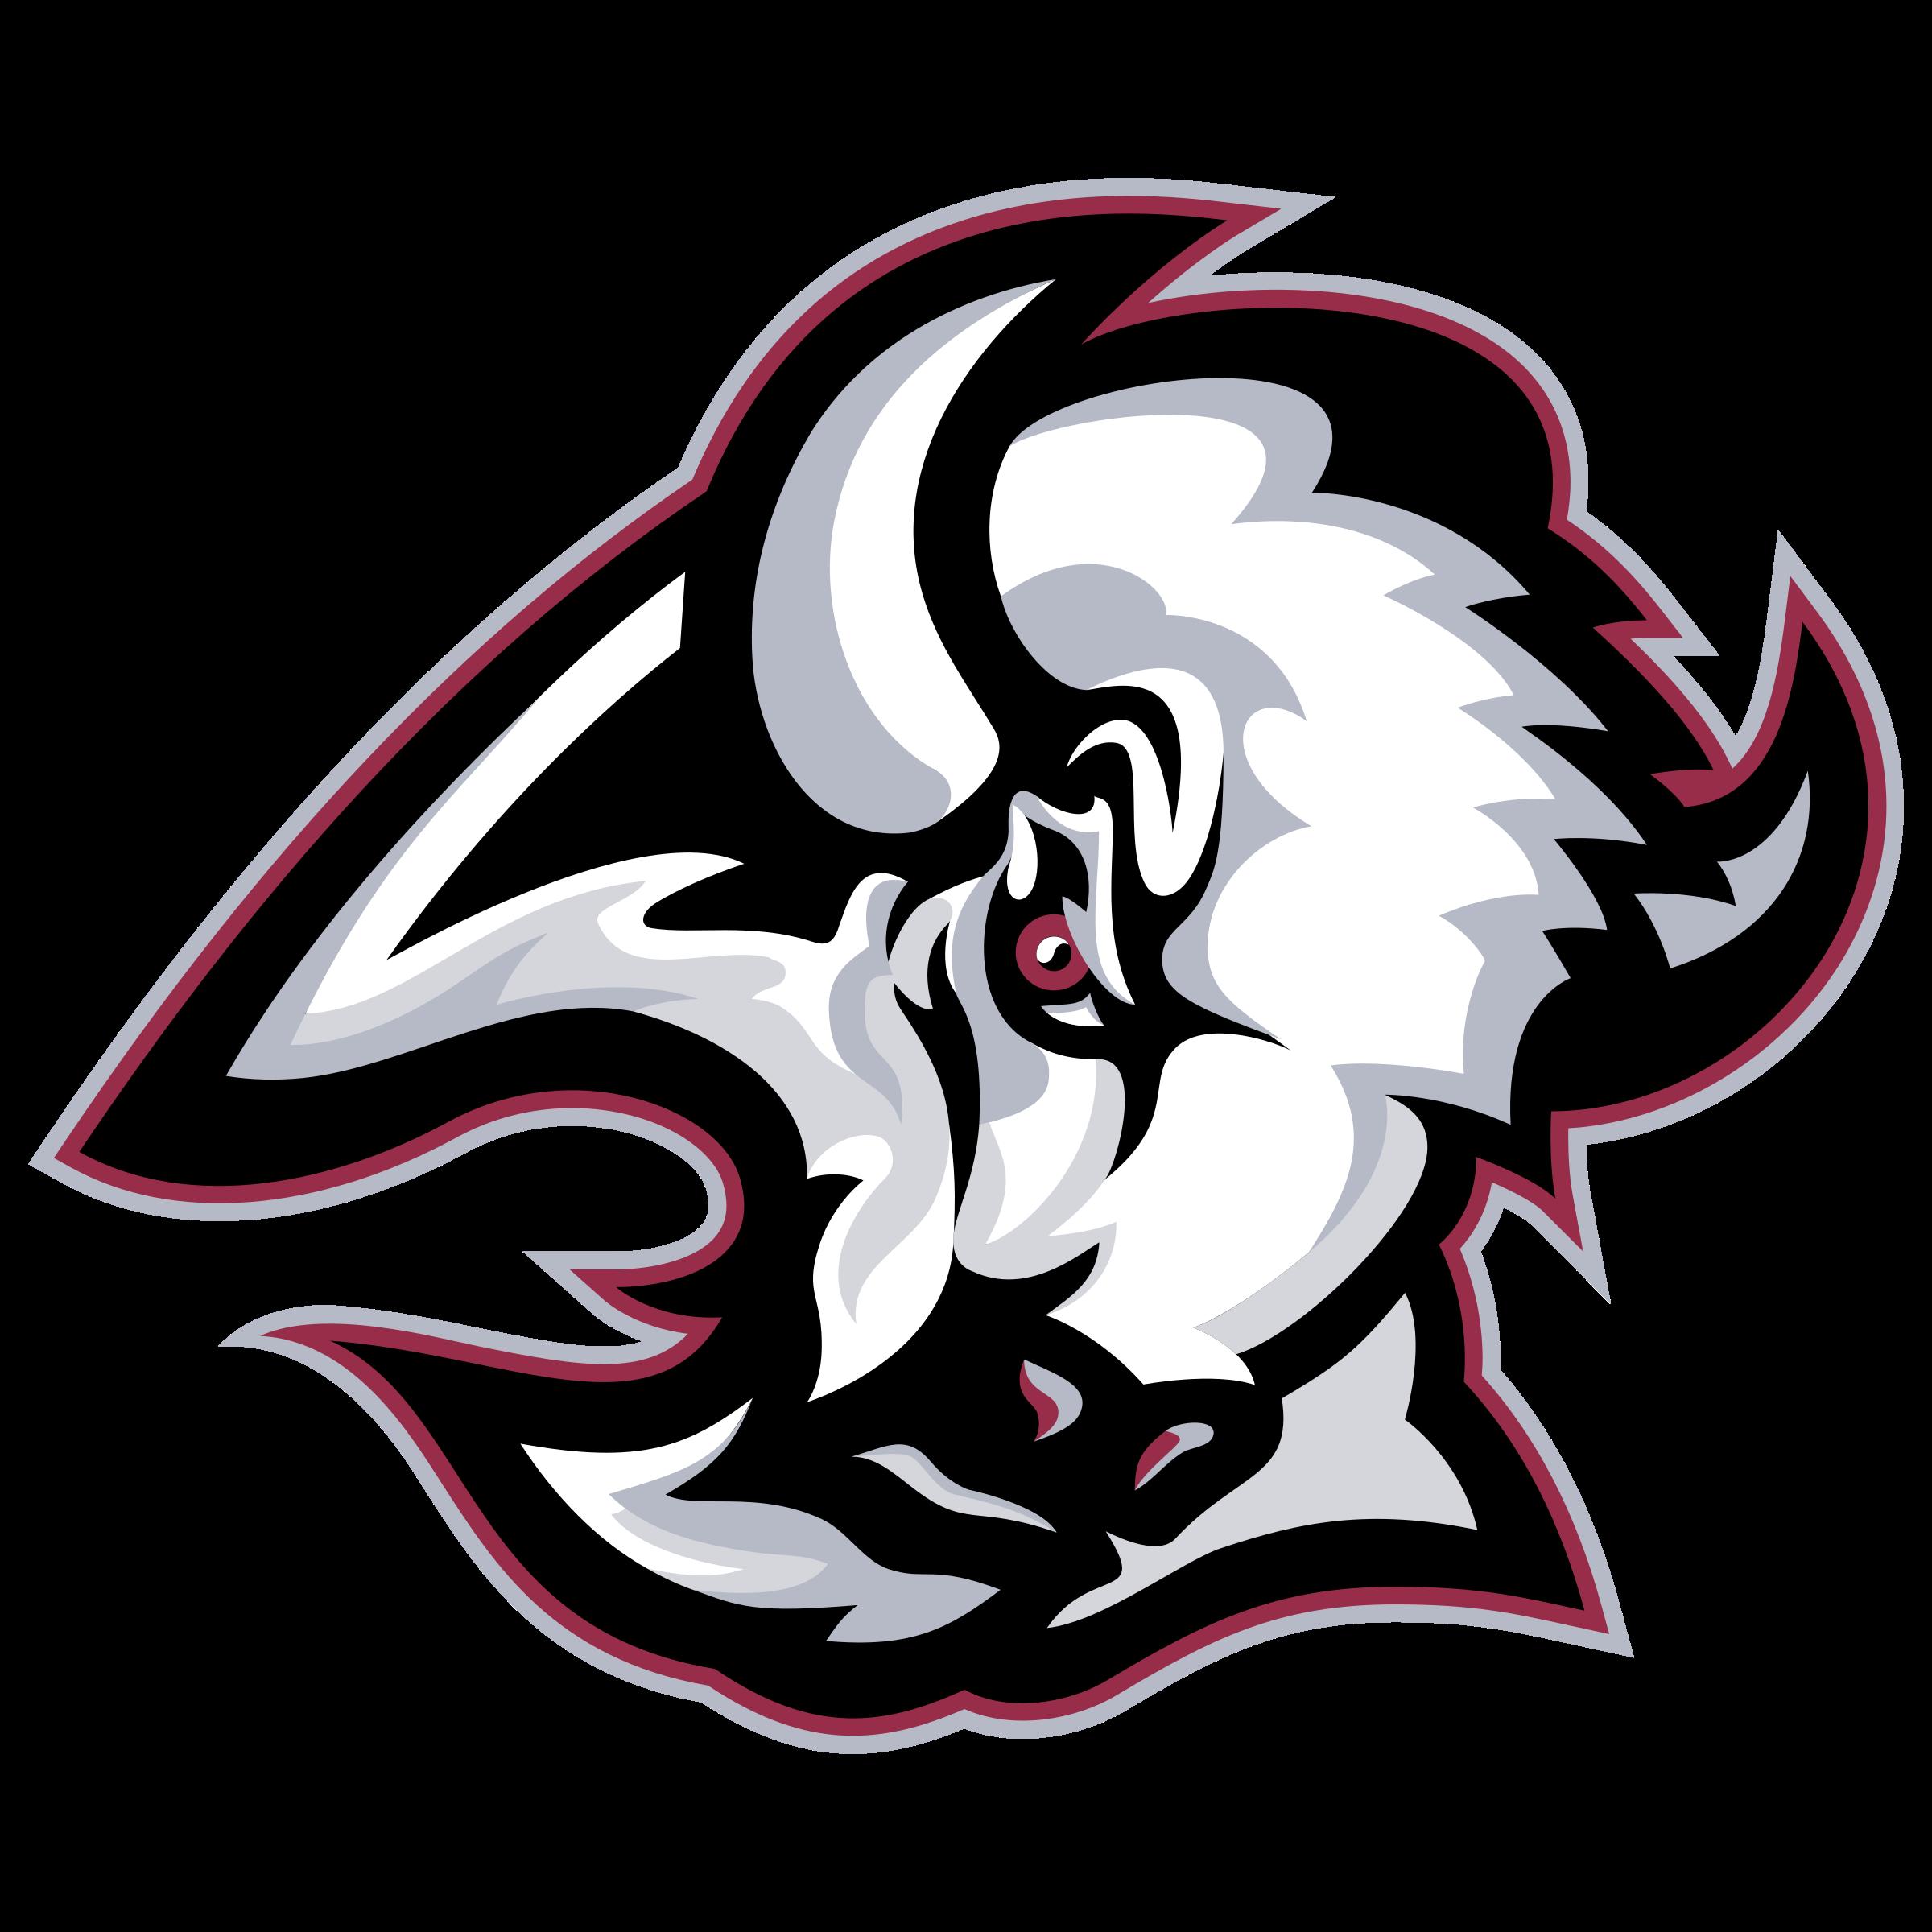 Image Result For Buffalo Sabres Logo Png Buffalo Sabres Car Bumper Stickers Nhl Hockey